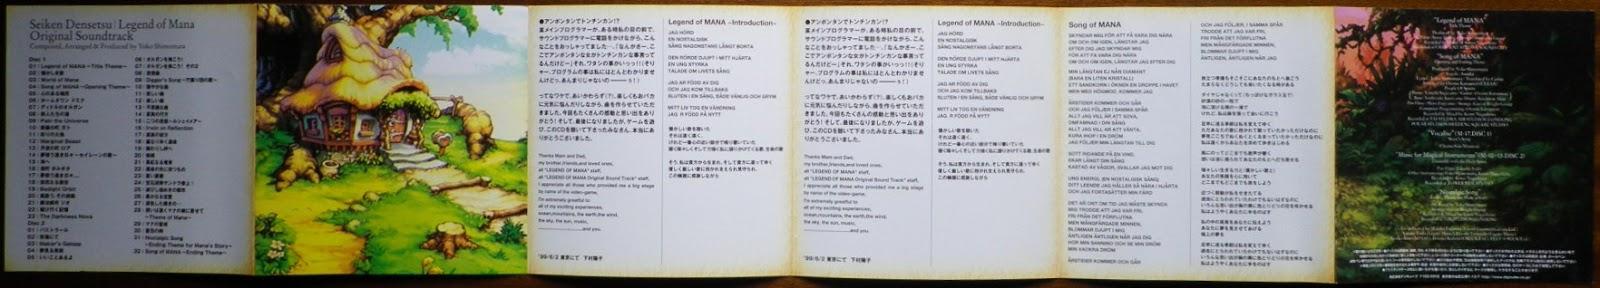 Legend of Mana OST - Desplegable lado 2